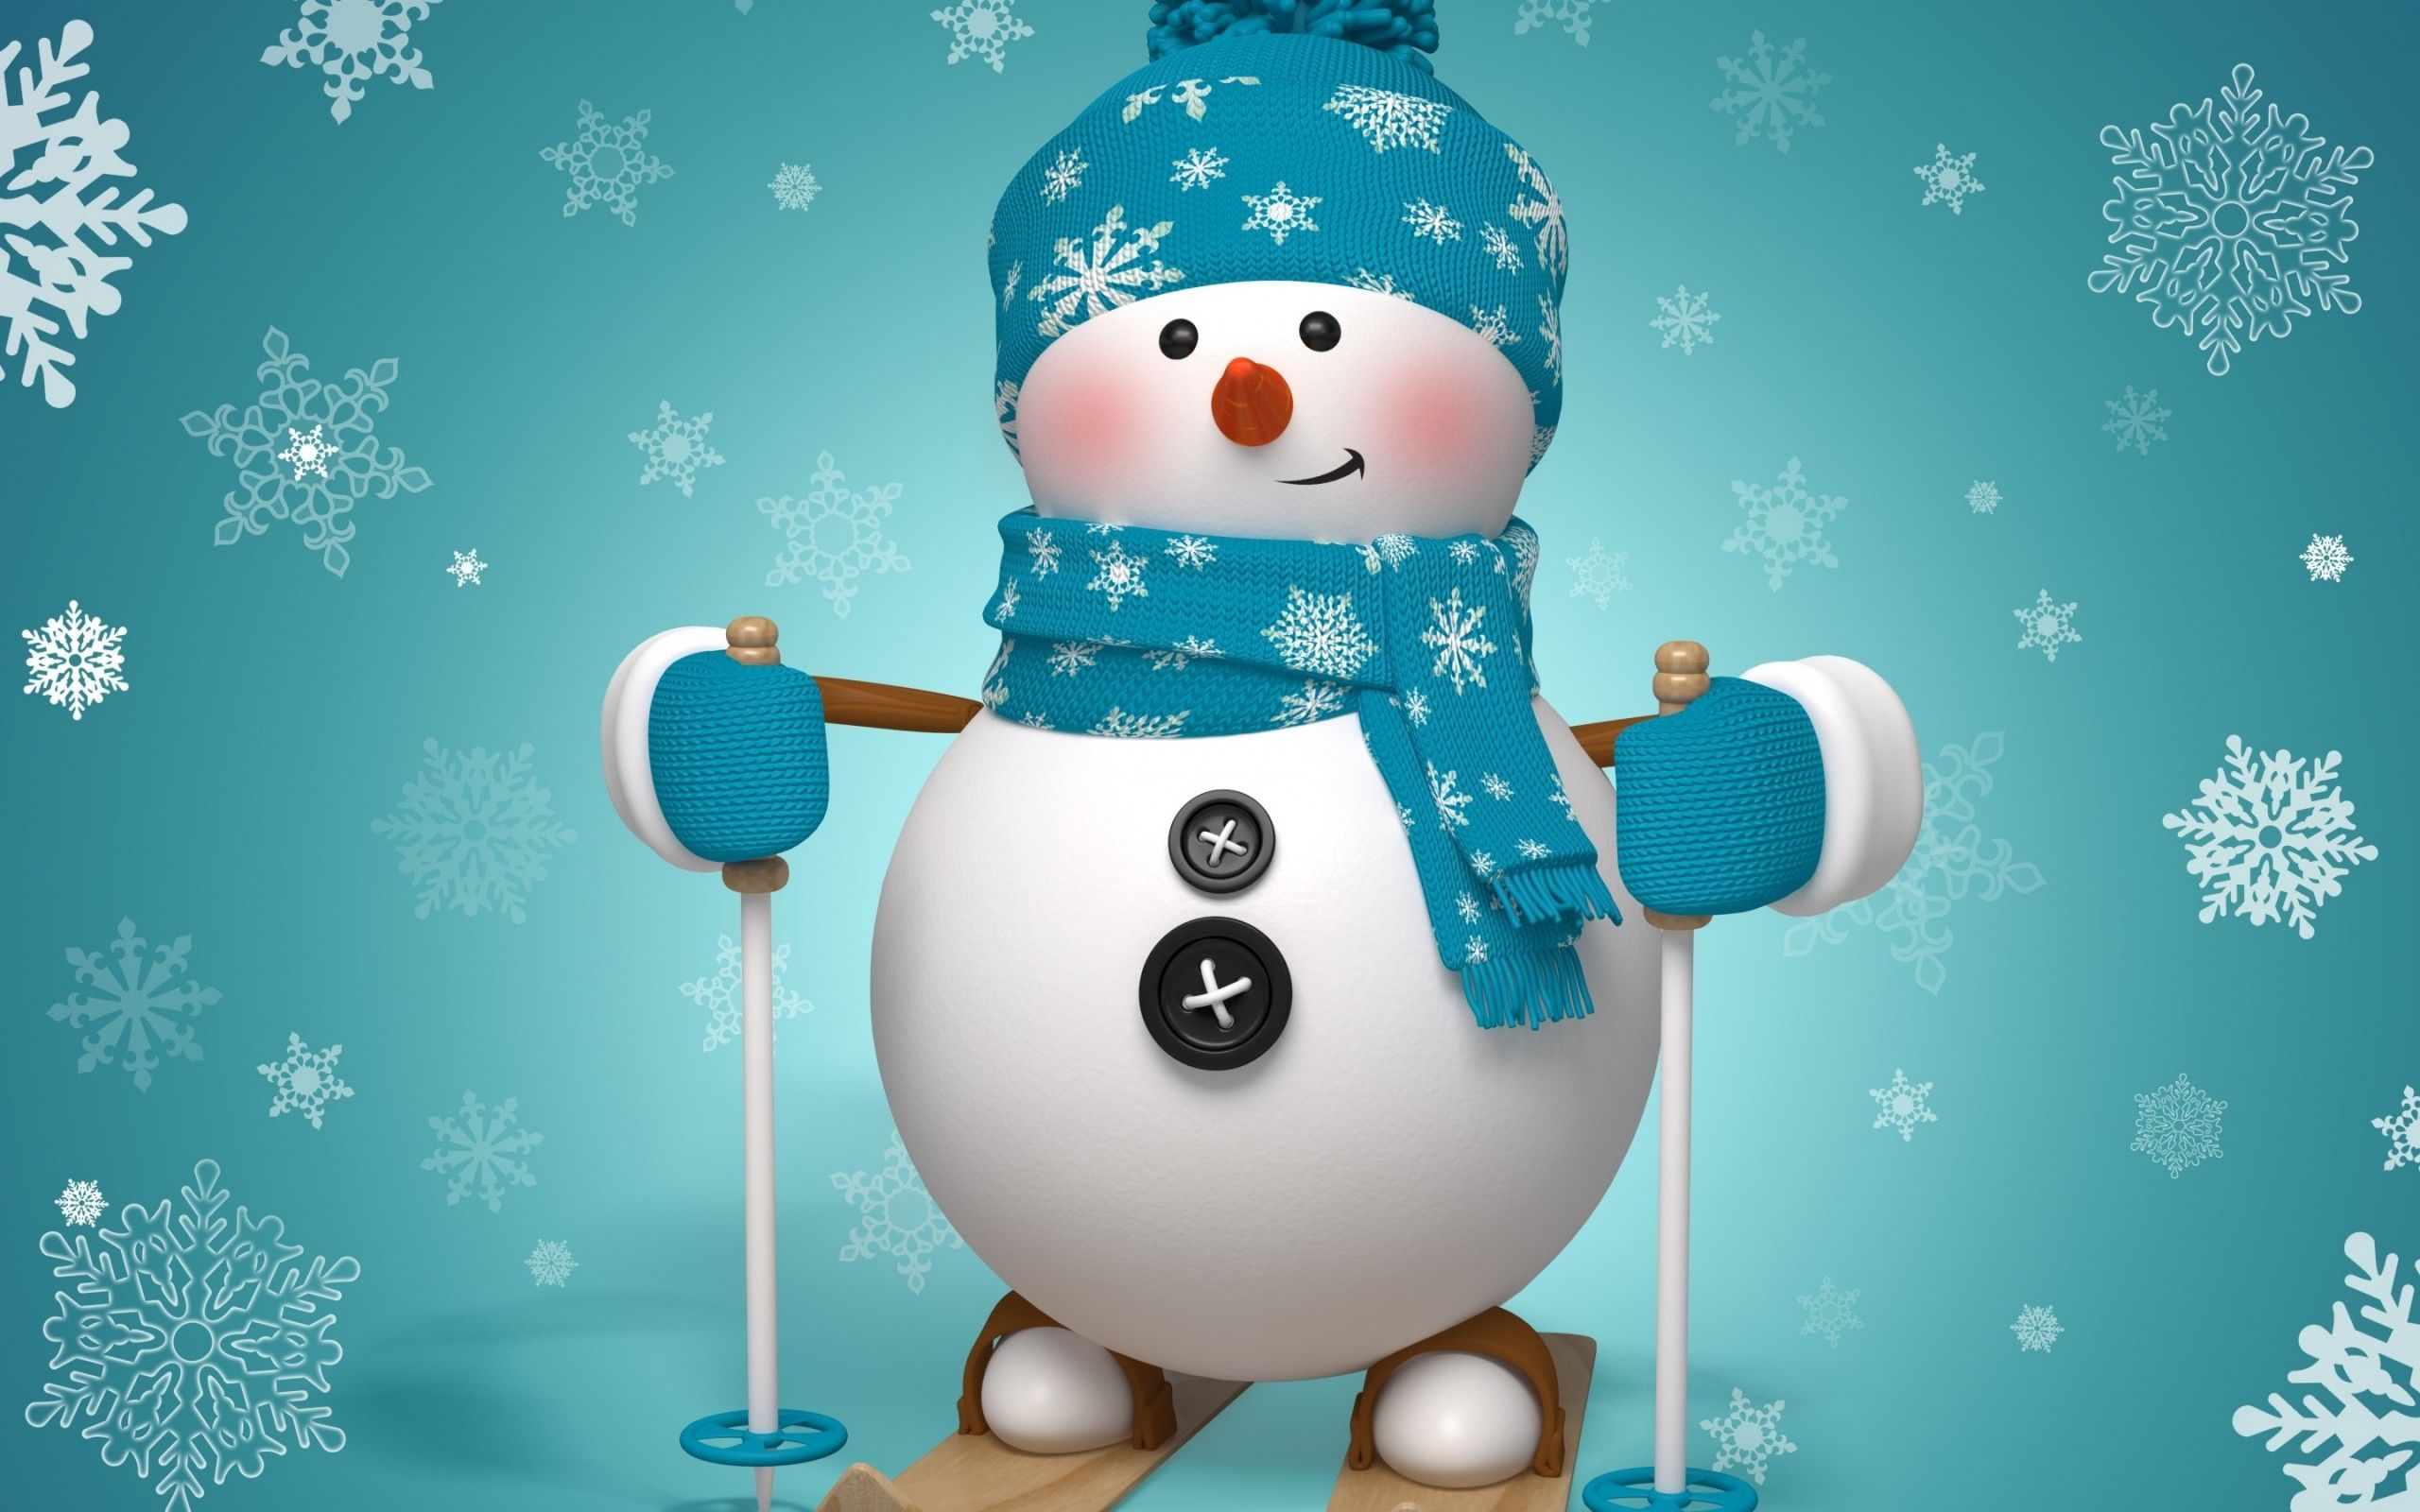 snowman images free